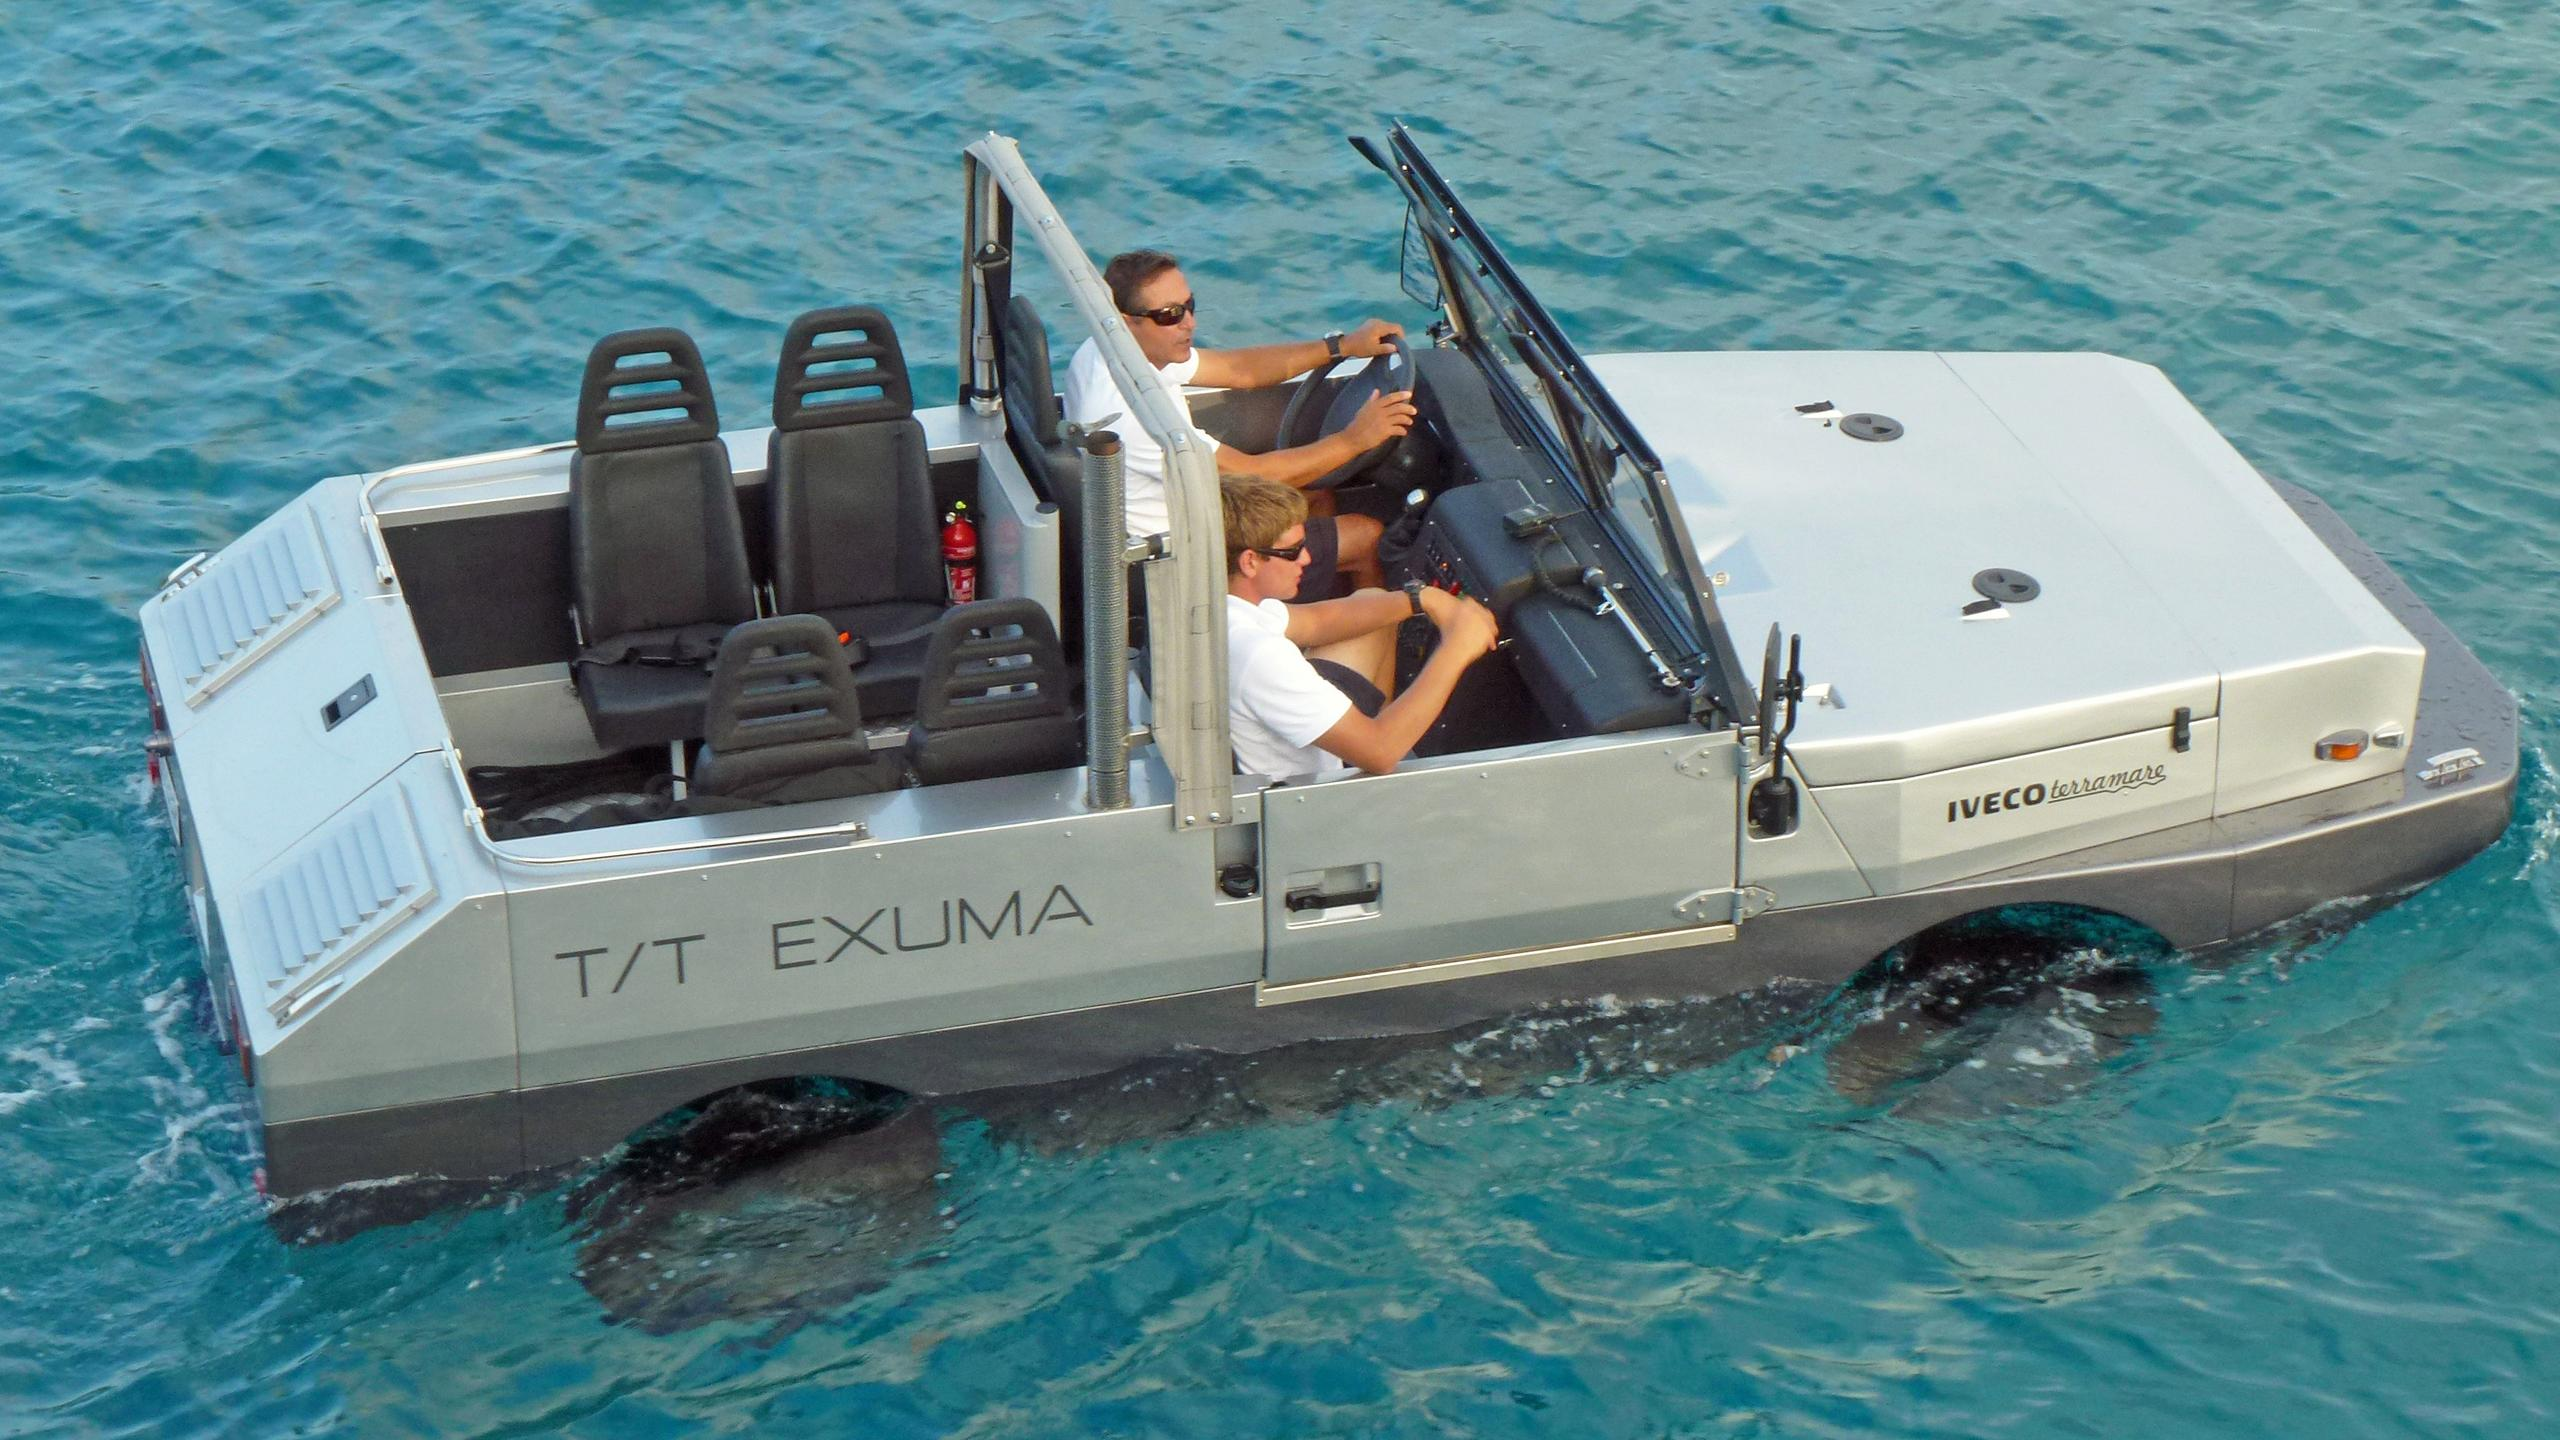 exuma-motor-yacht-perini-navi-picchiotti-2010-50m-jeep